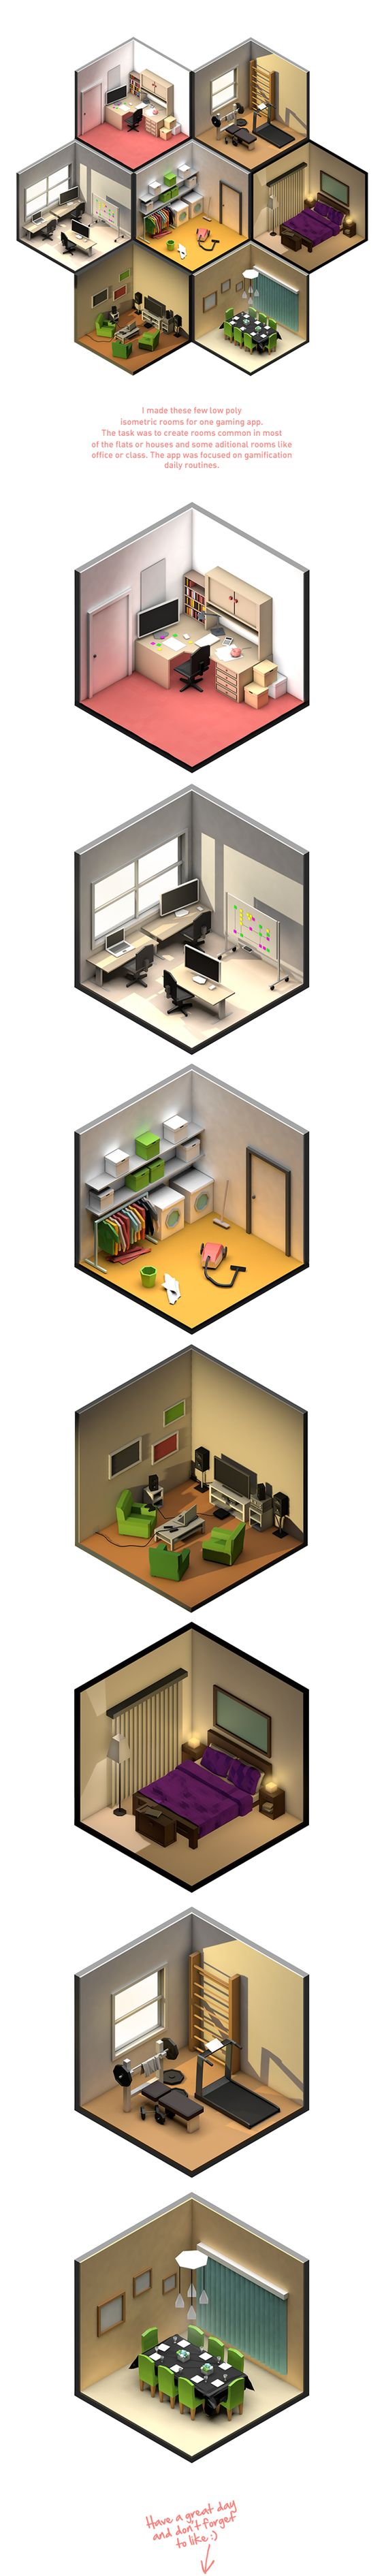 Low Poly rooms by Petr Kollarcik, via Behance